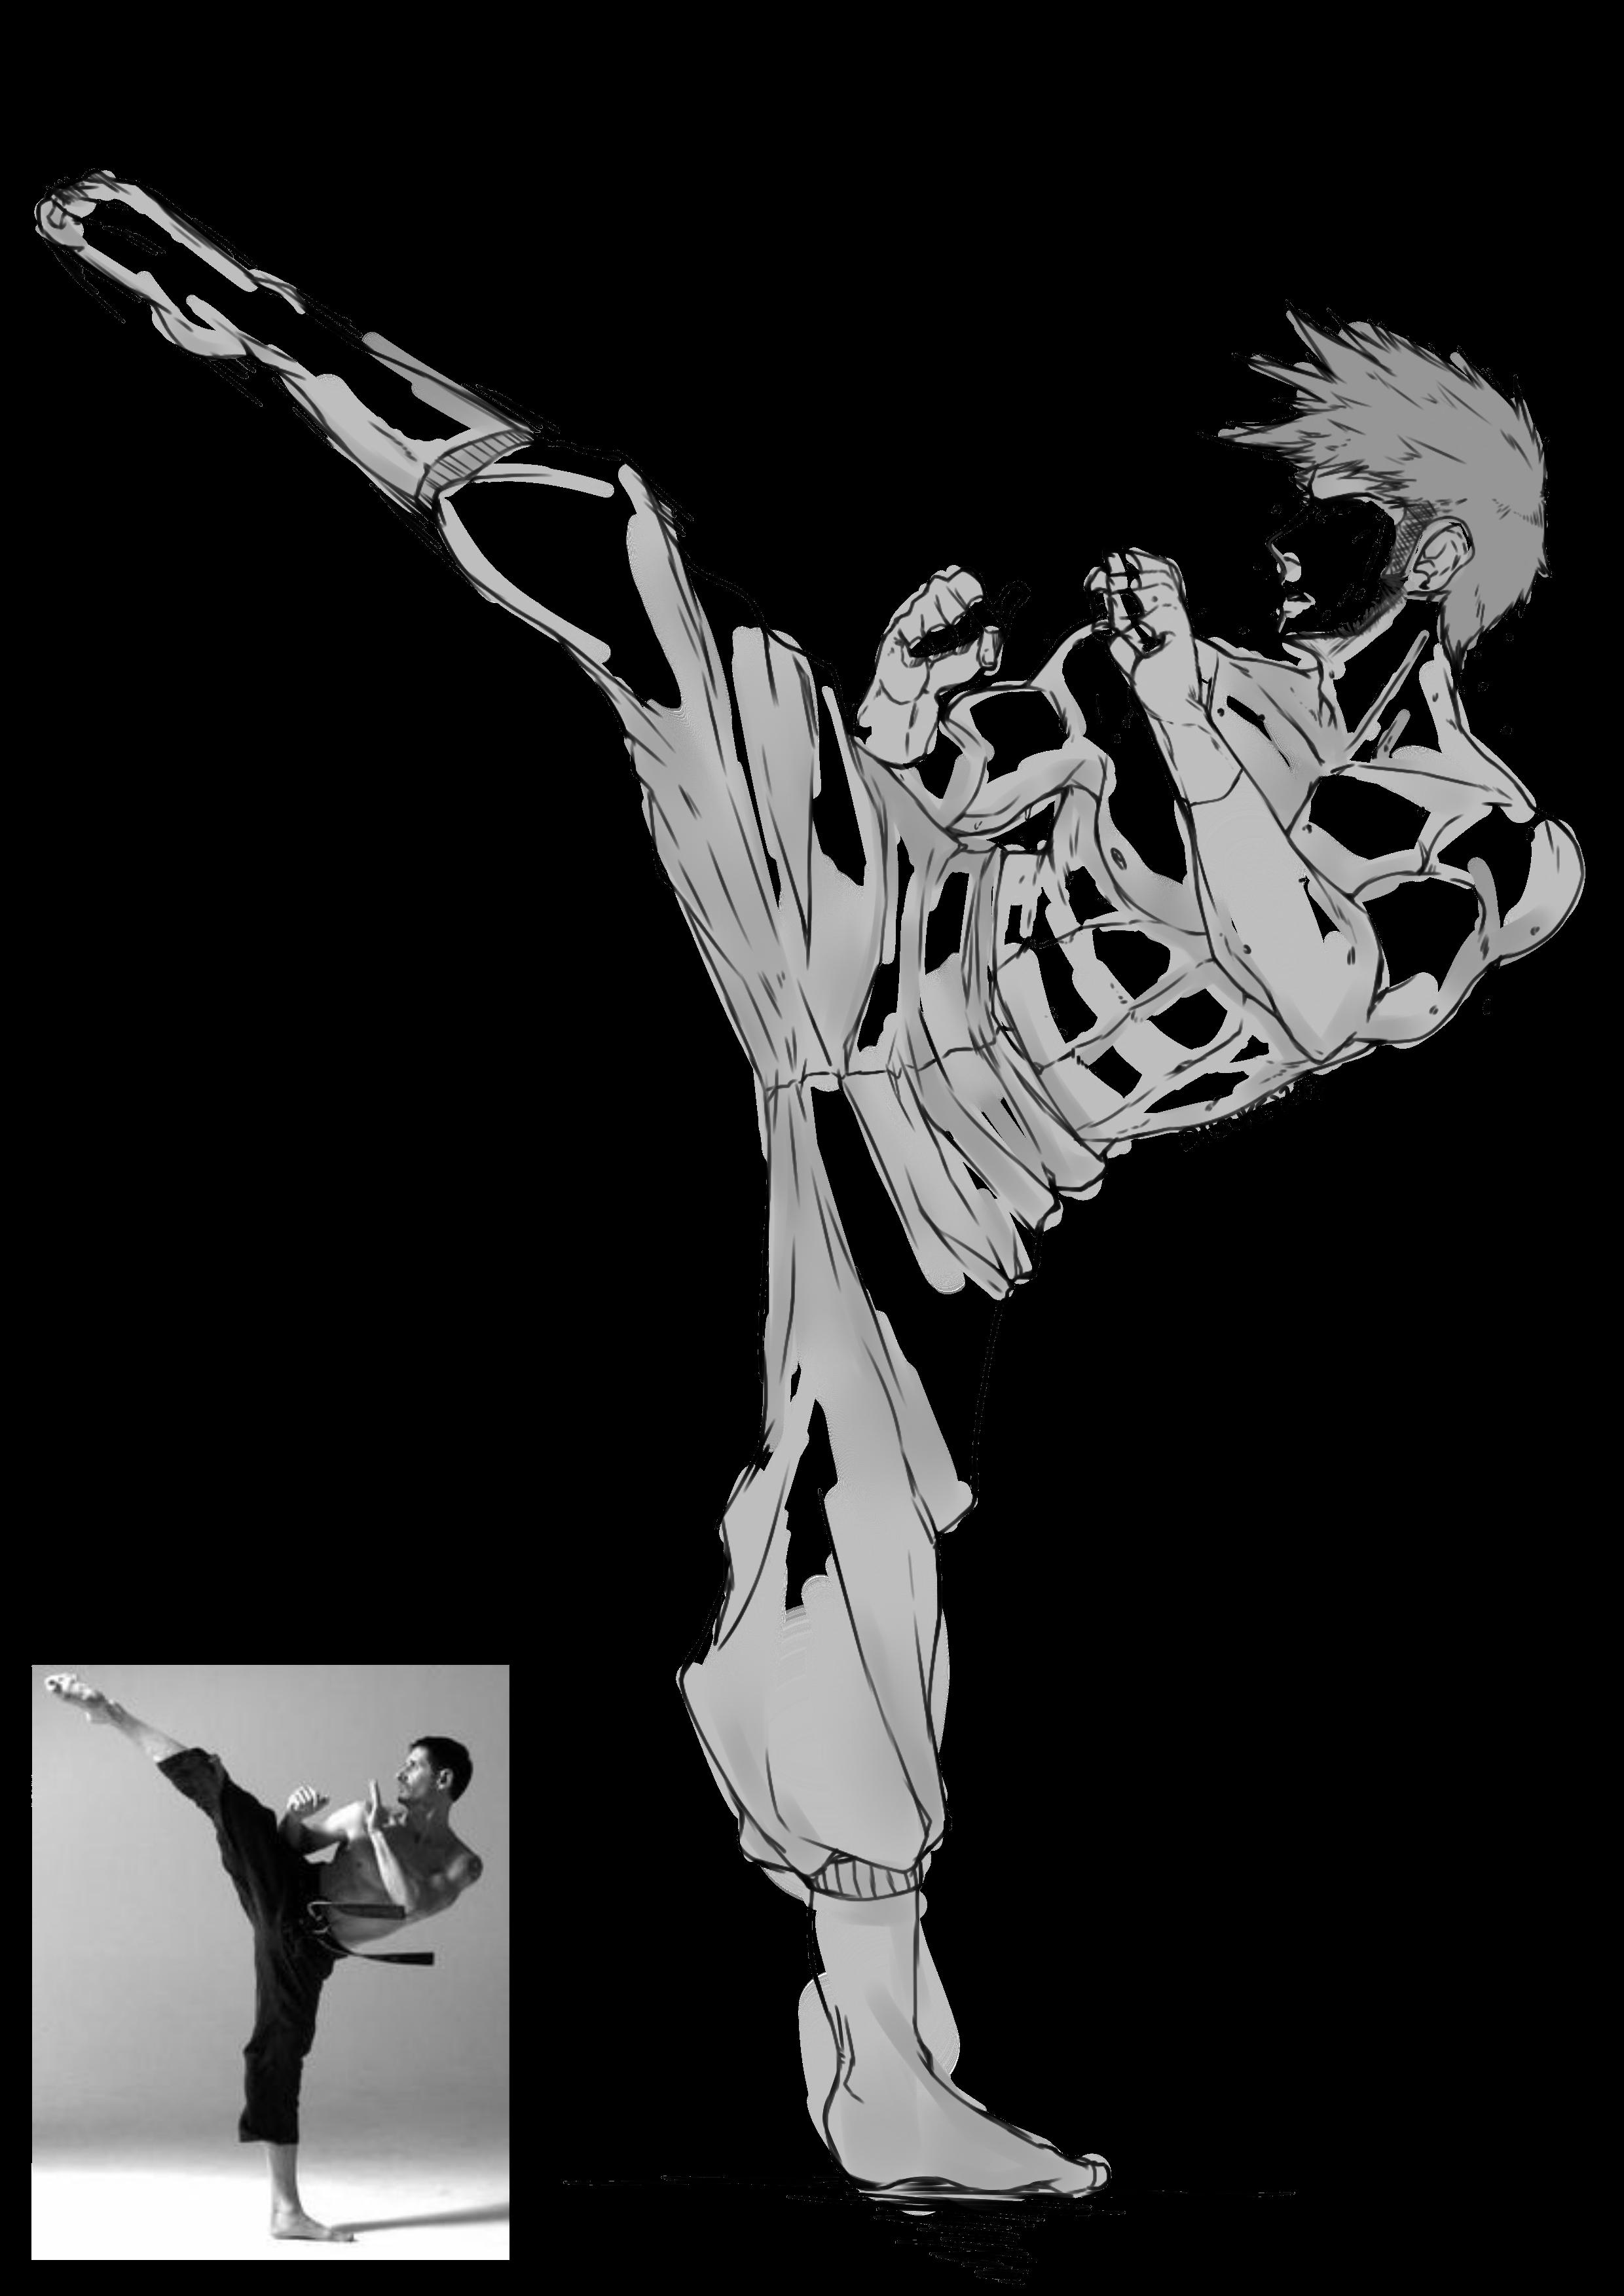 anatomy practice | Anatomy practice, Character design ...